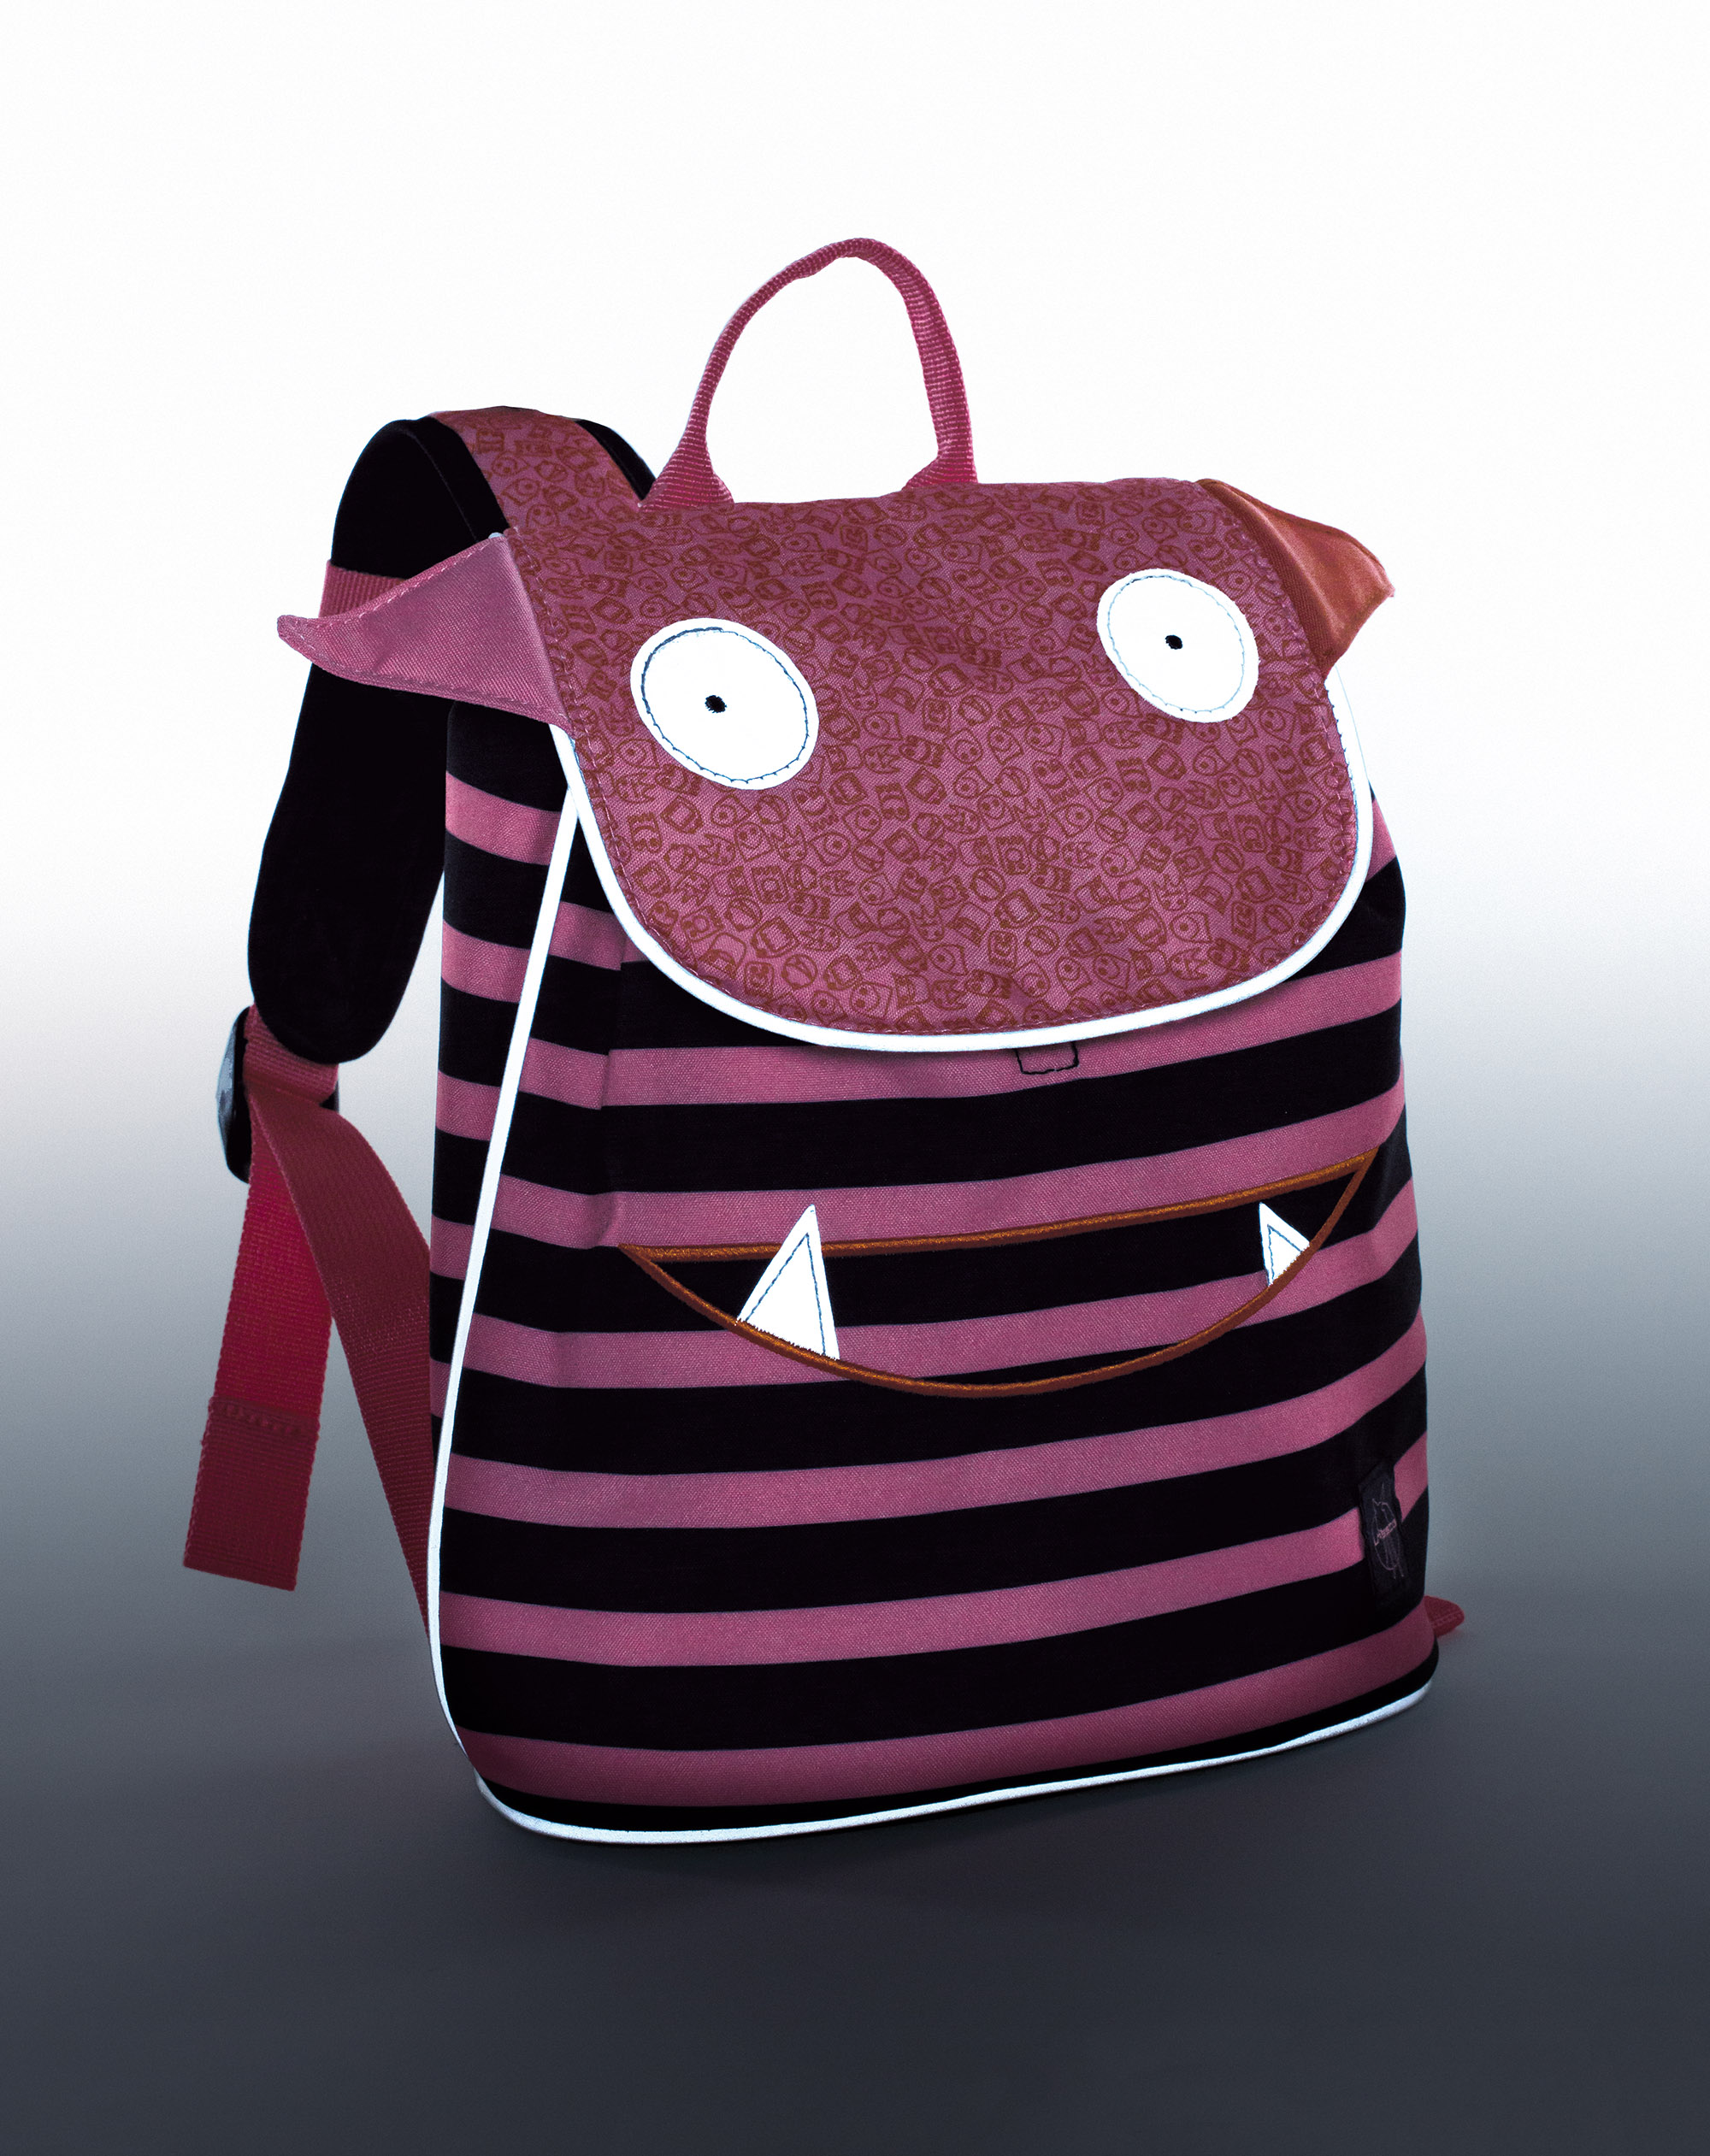 5173bcea13 Laessig Mini Duffle τσάντα πλάτης Little Monsters - Je t aime